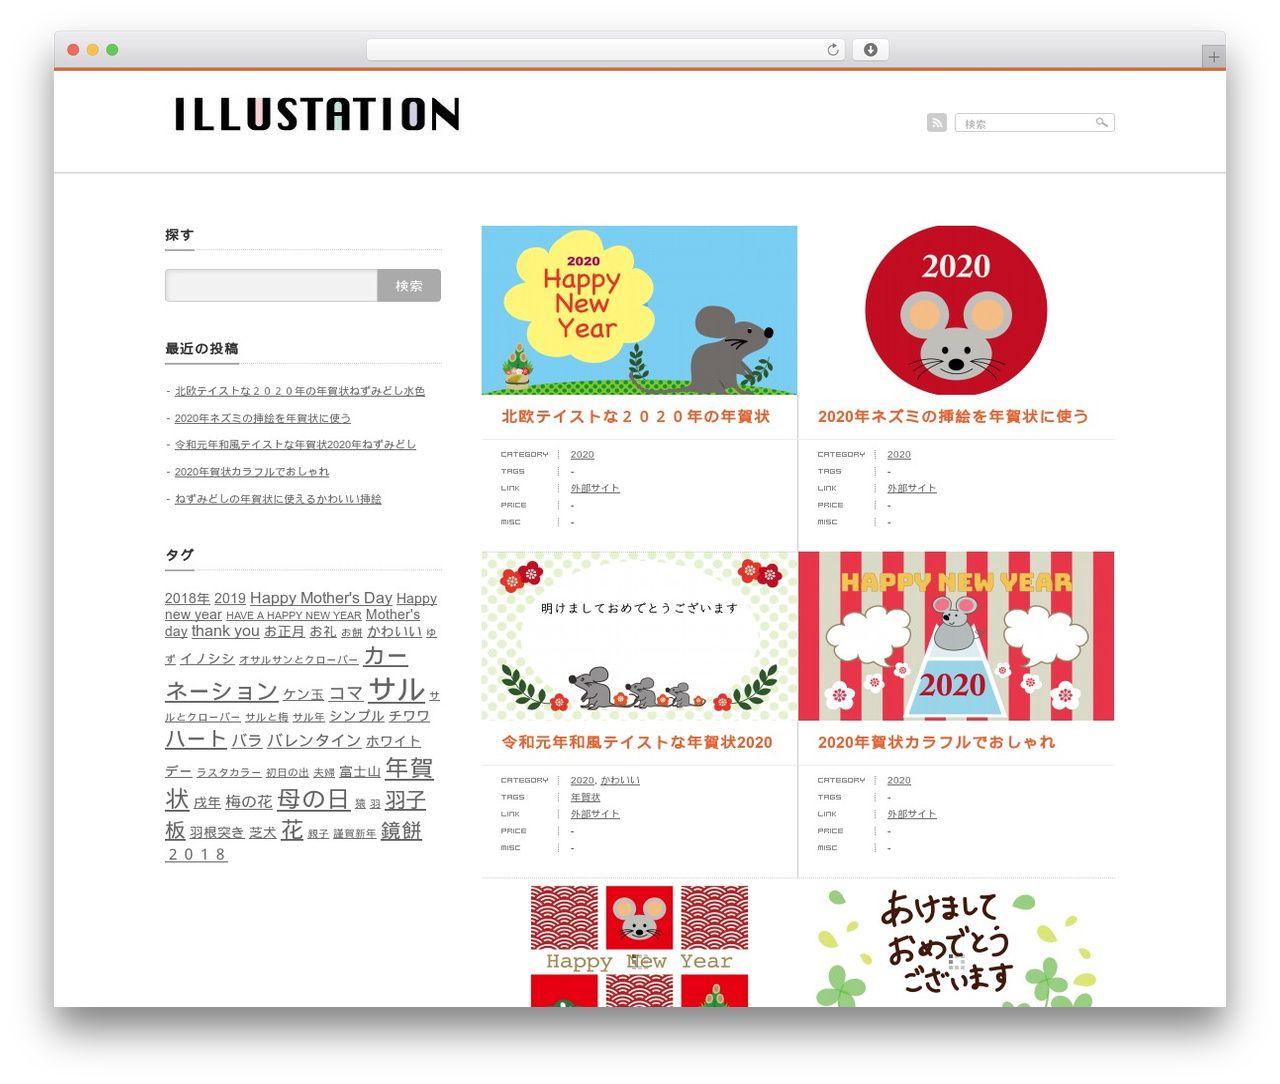 Gallery Tcd012 Wordpress Website Template Illustation Net Website Templates Wordpress Website Template Wordpress Website